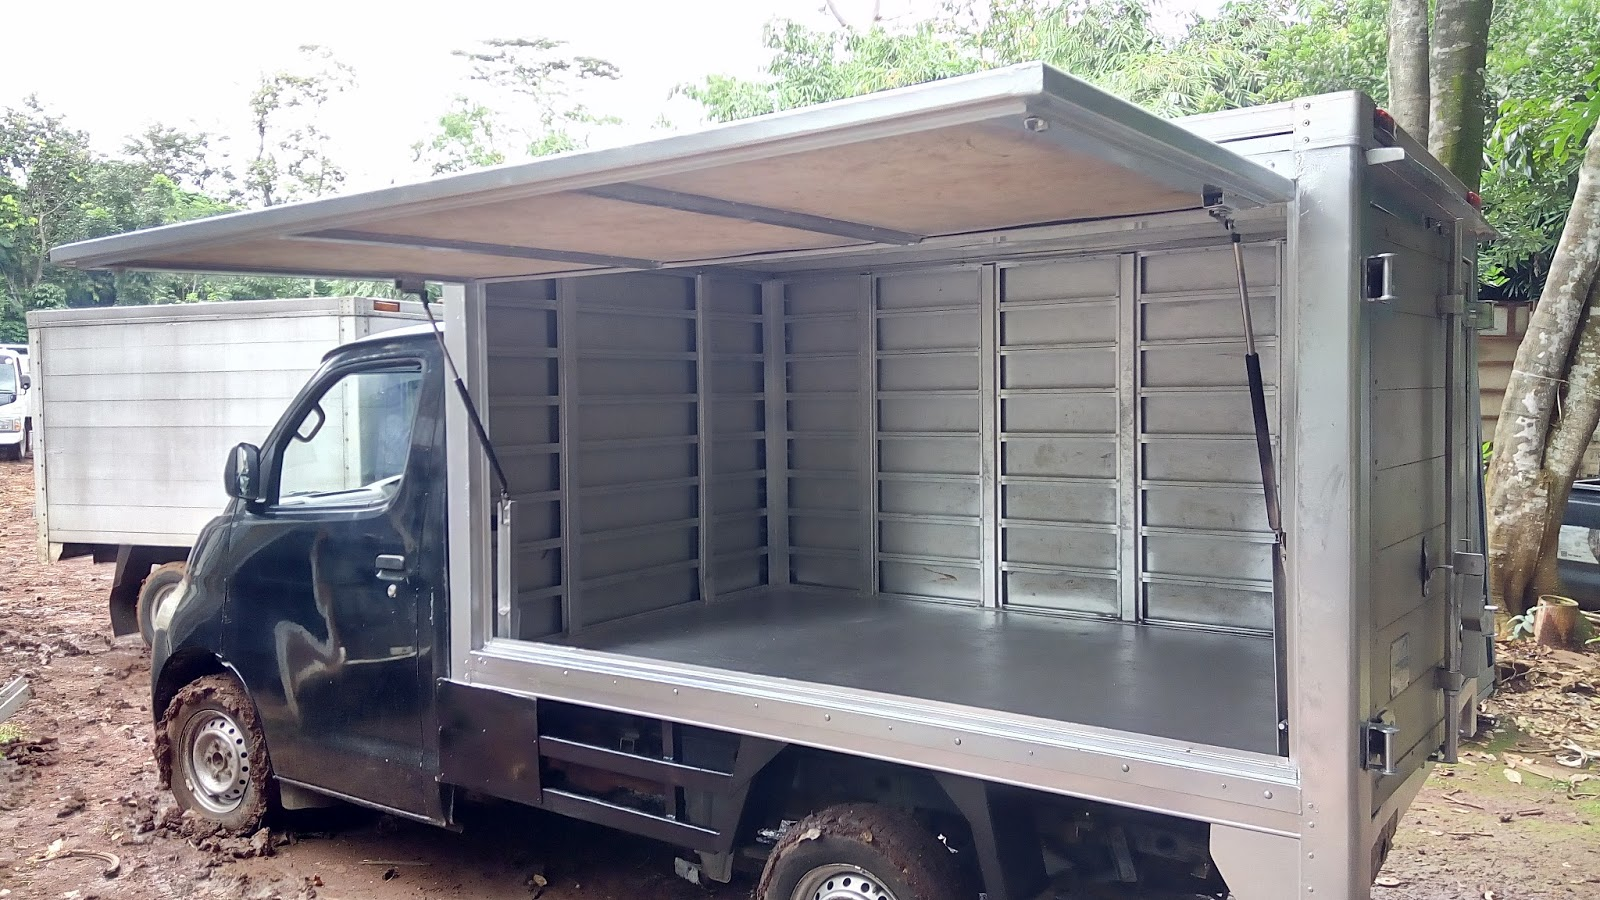 Jual Beli Bak Dan Bok Mobil Box Box Kendaraan Kecil